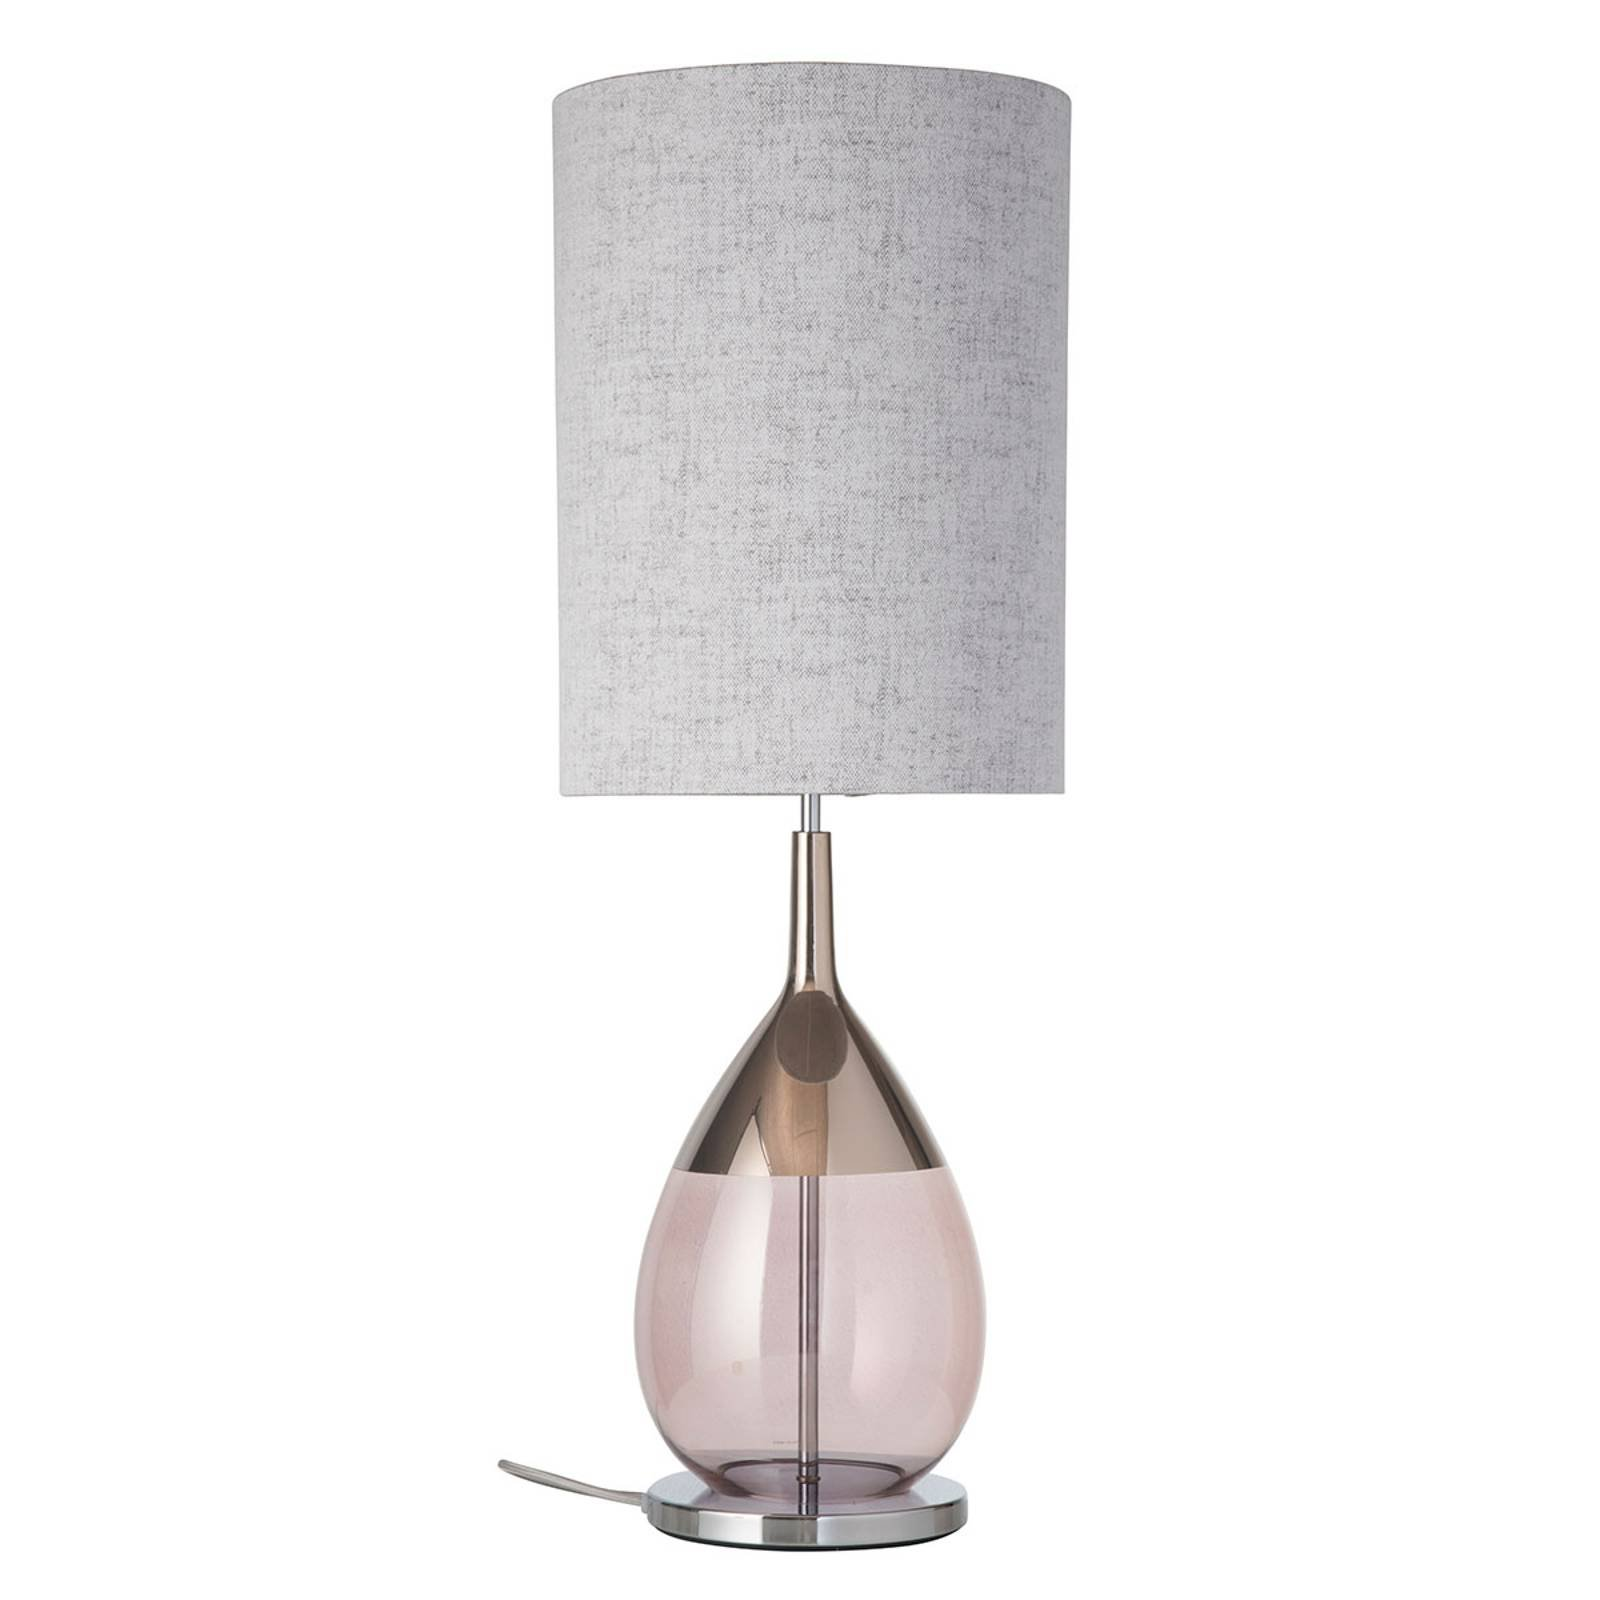 EBB & FLOW Lute bordlampe med skjerm, Marl